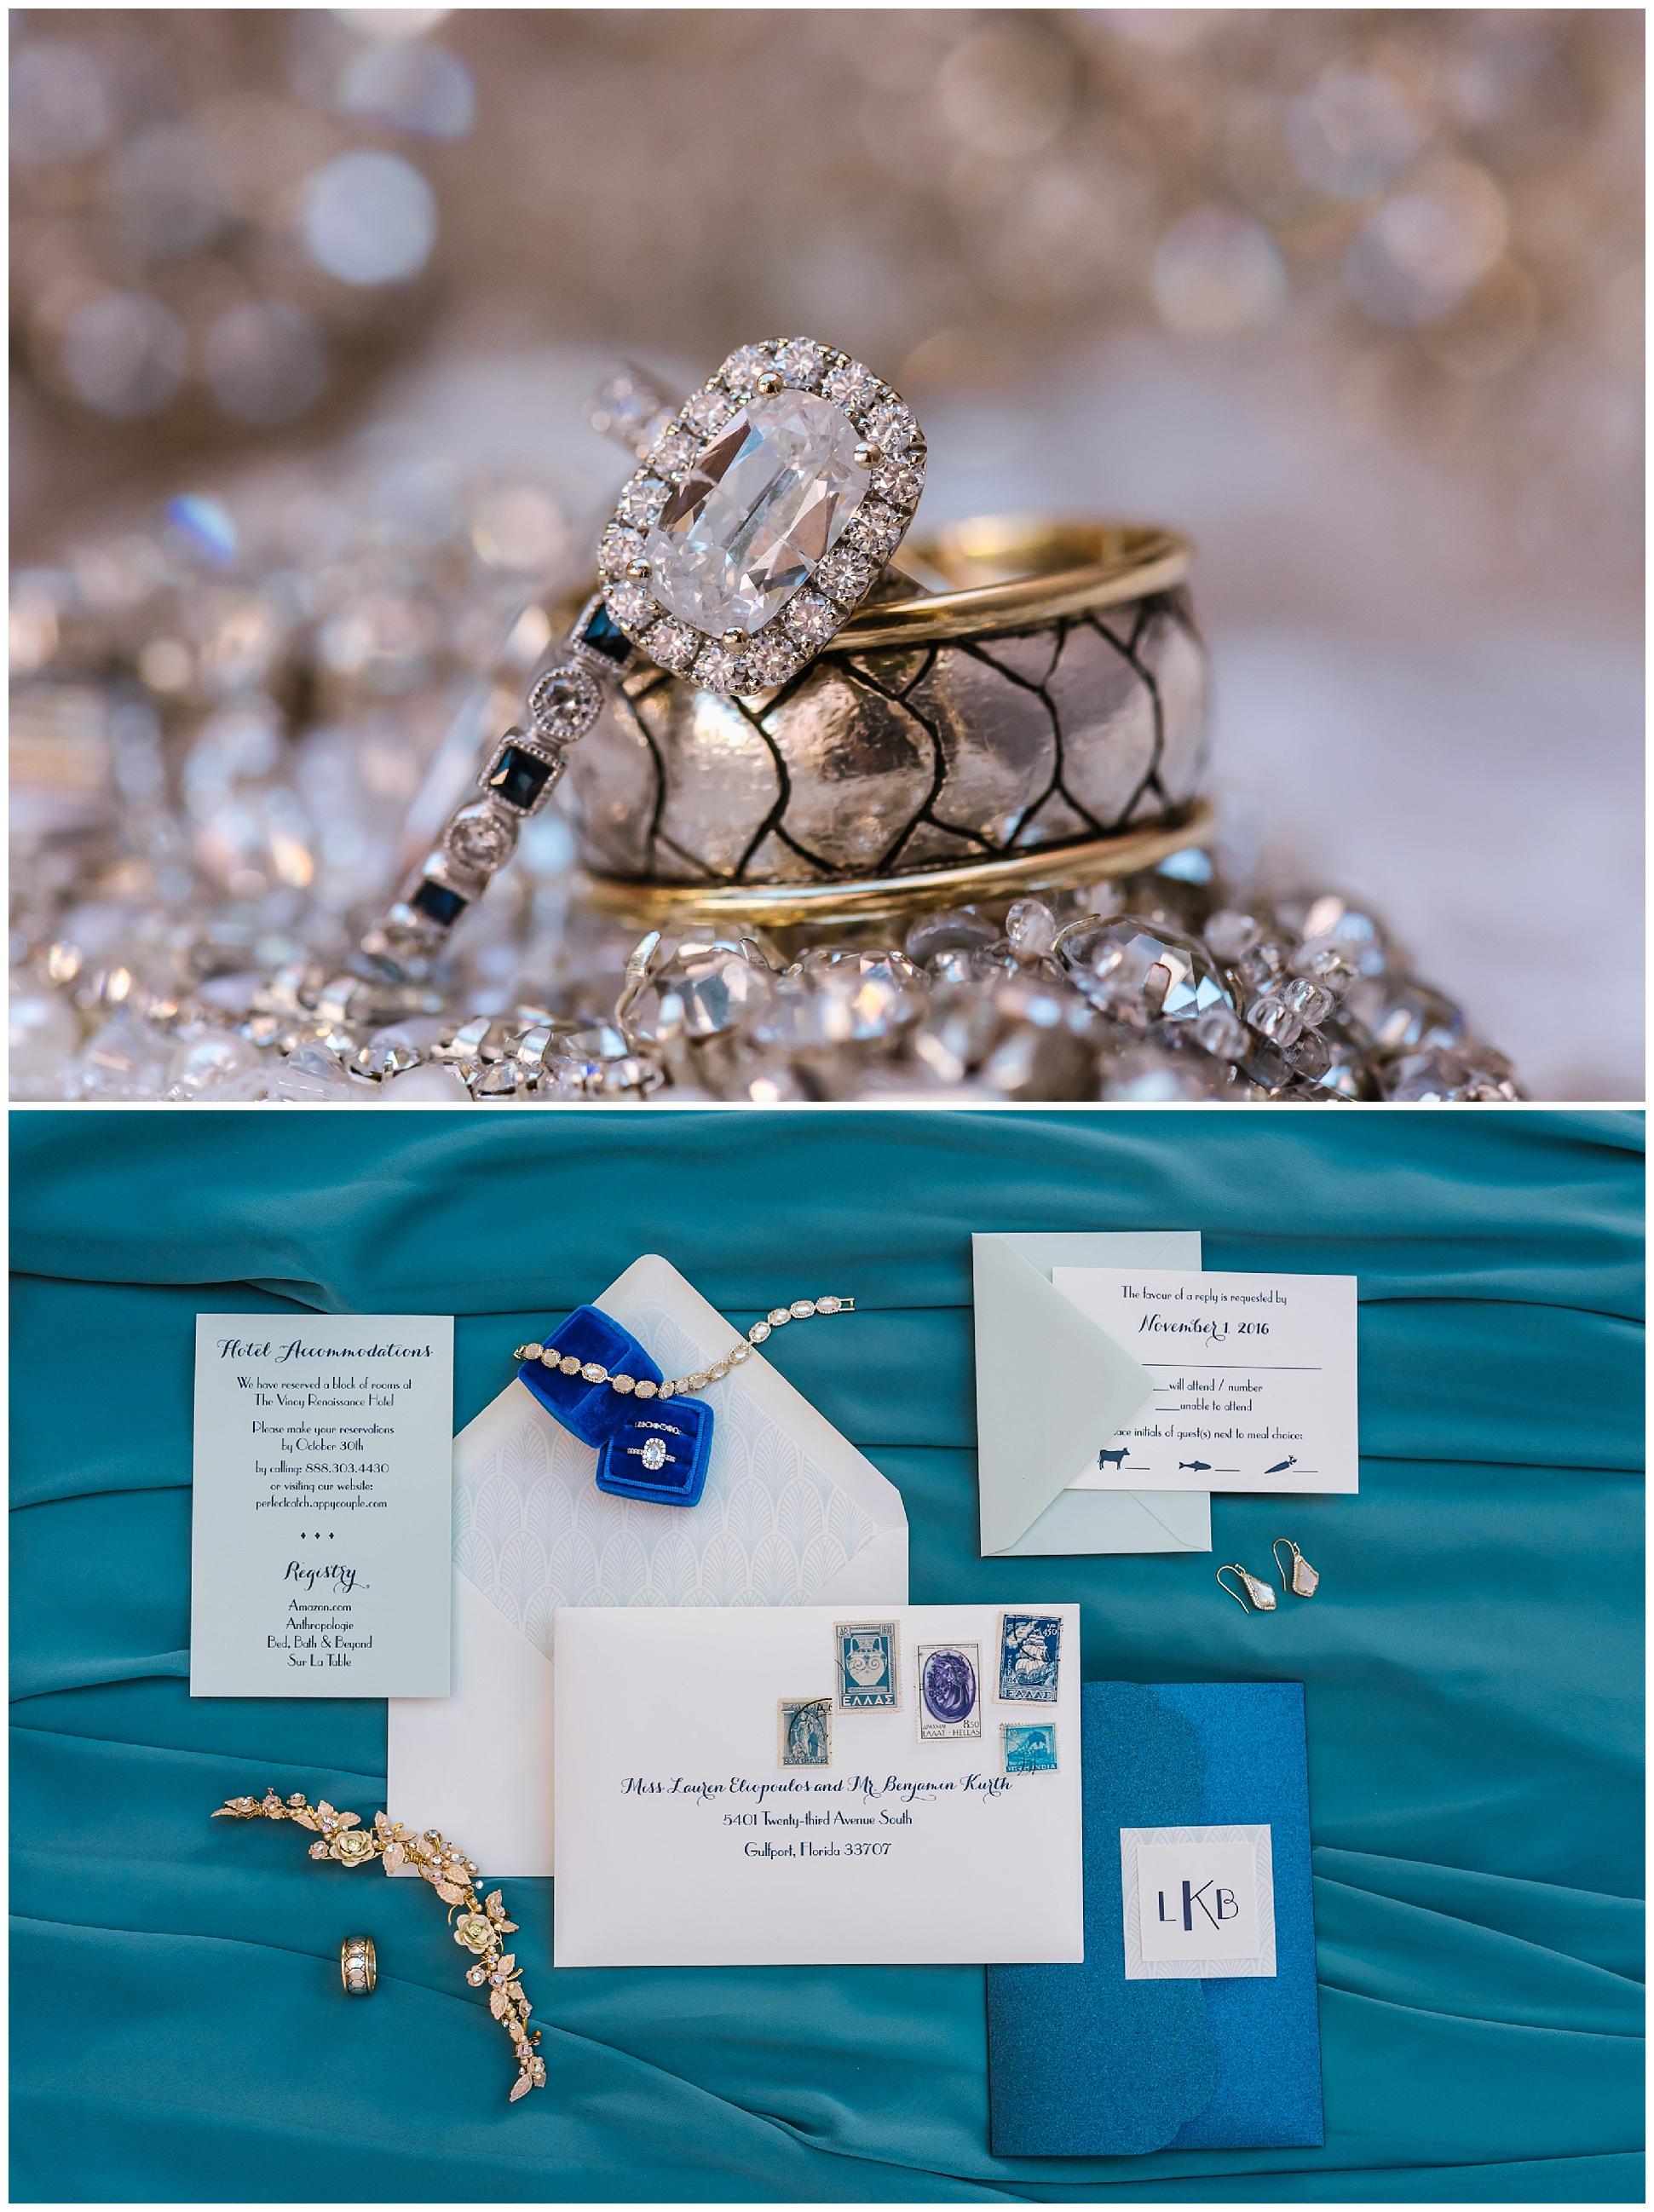 Ashlee-hamon-photography-year-in-review-2016-travel-wanderlust-vsco-adventure-wedding_0072.jpg